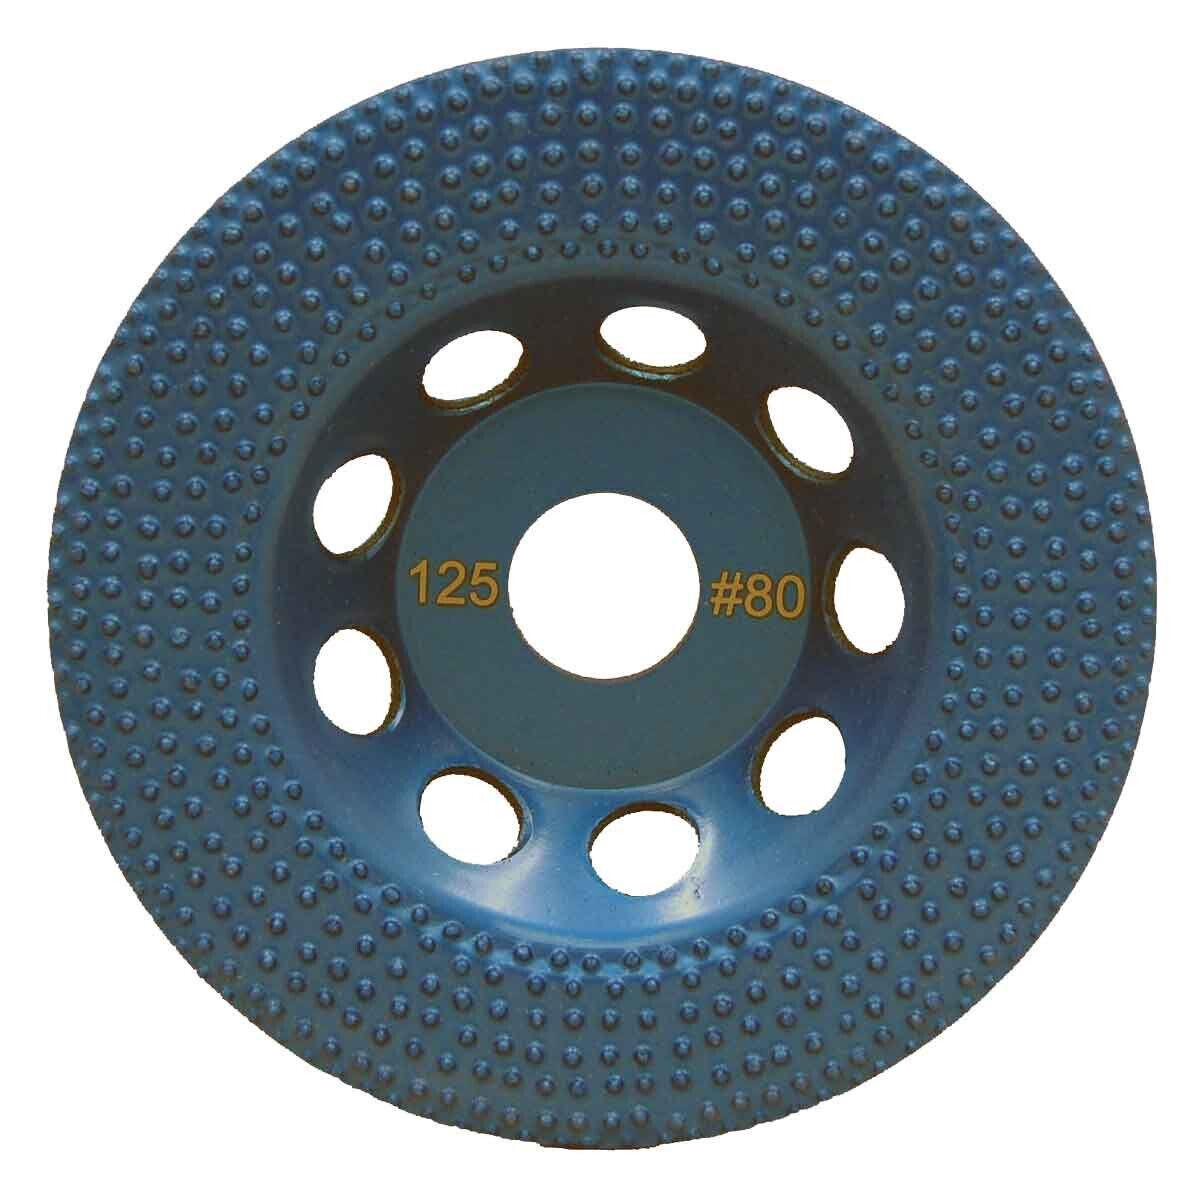 DITEQ 7 inch Vacuum Brazed Spike Disc - 80 Grit